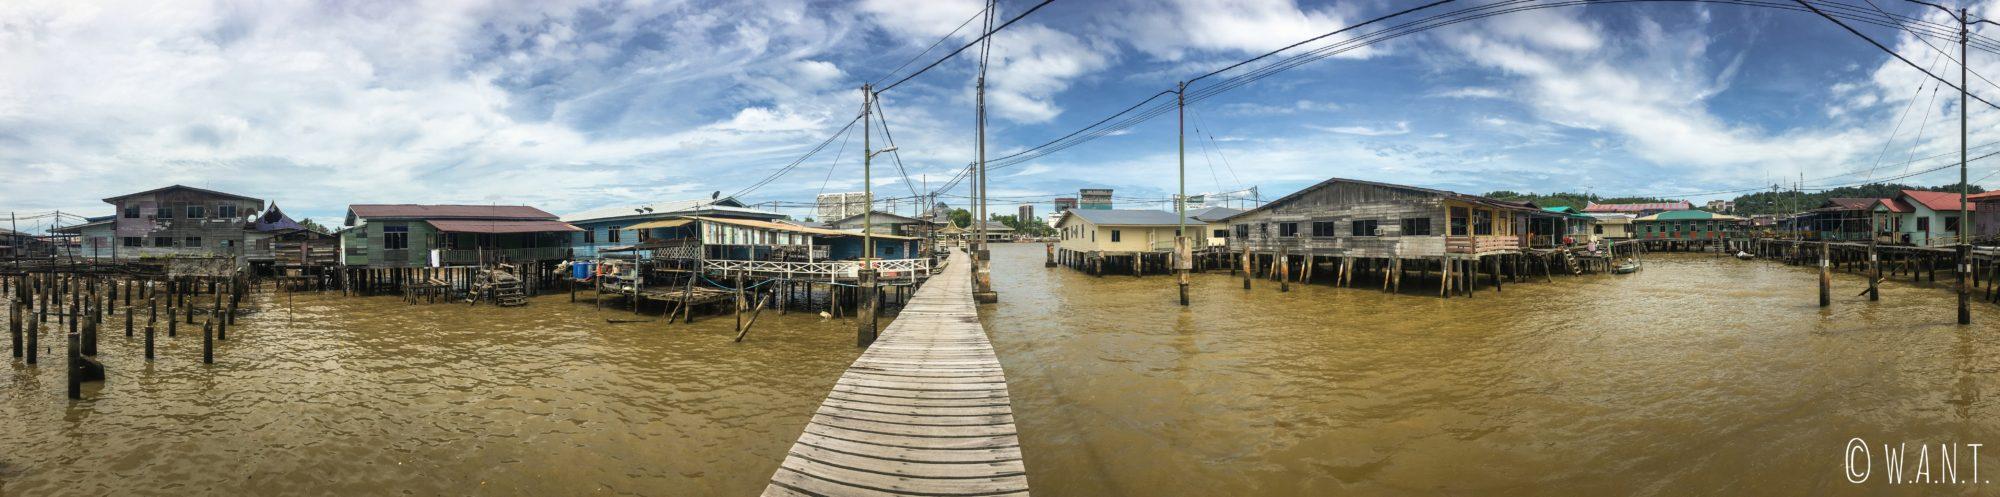 Panorama à l'intérieur du village flottant de Kampong Ayer à Bandar Seri Begawan